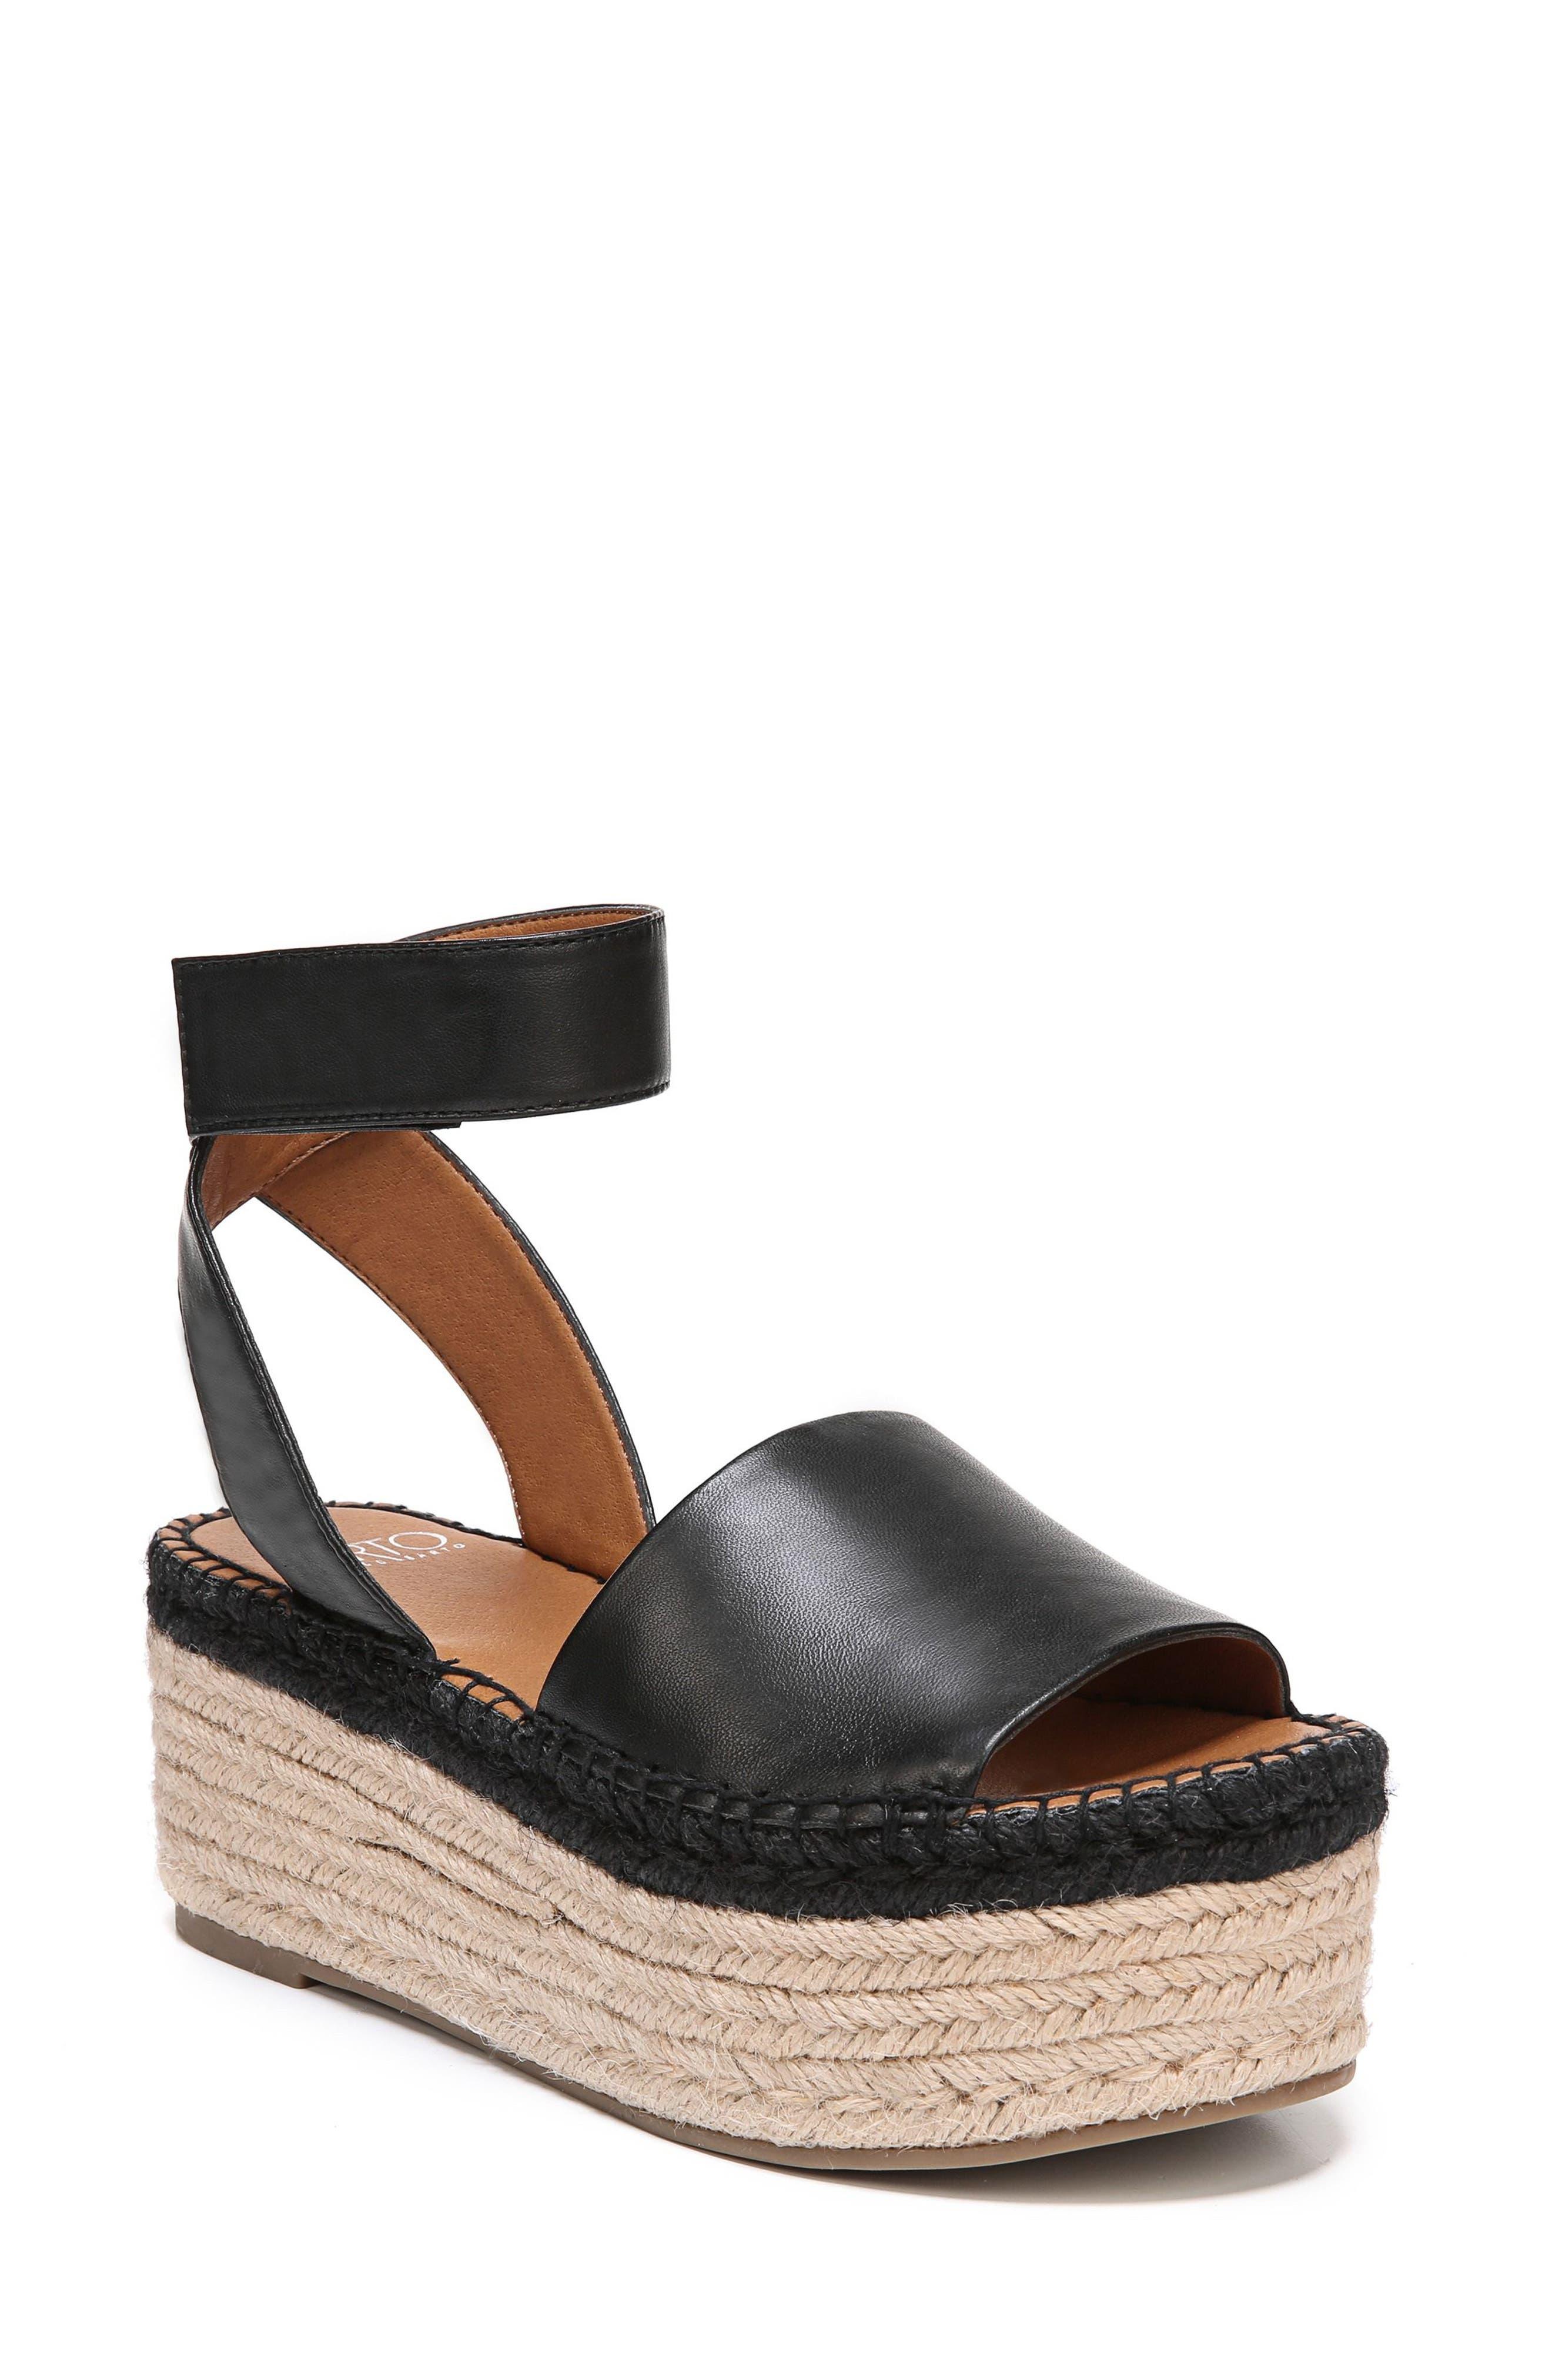 Maisi Platform Espadrille Sandal,                         Main,                         color, BLACK LEATHER